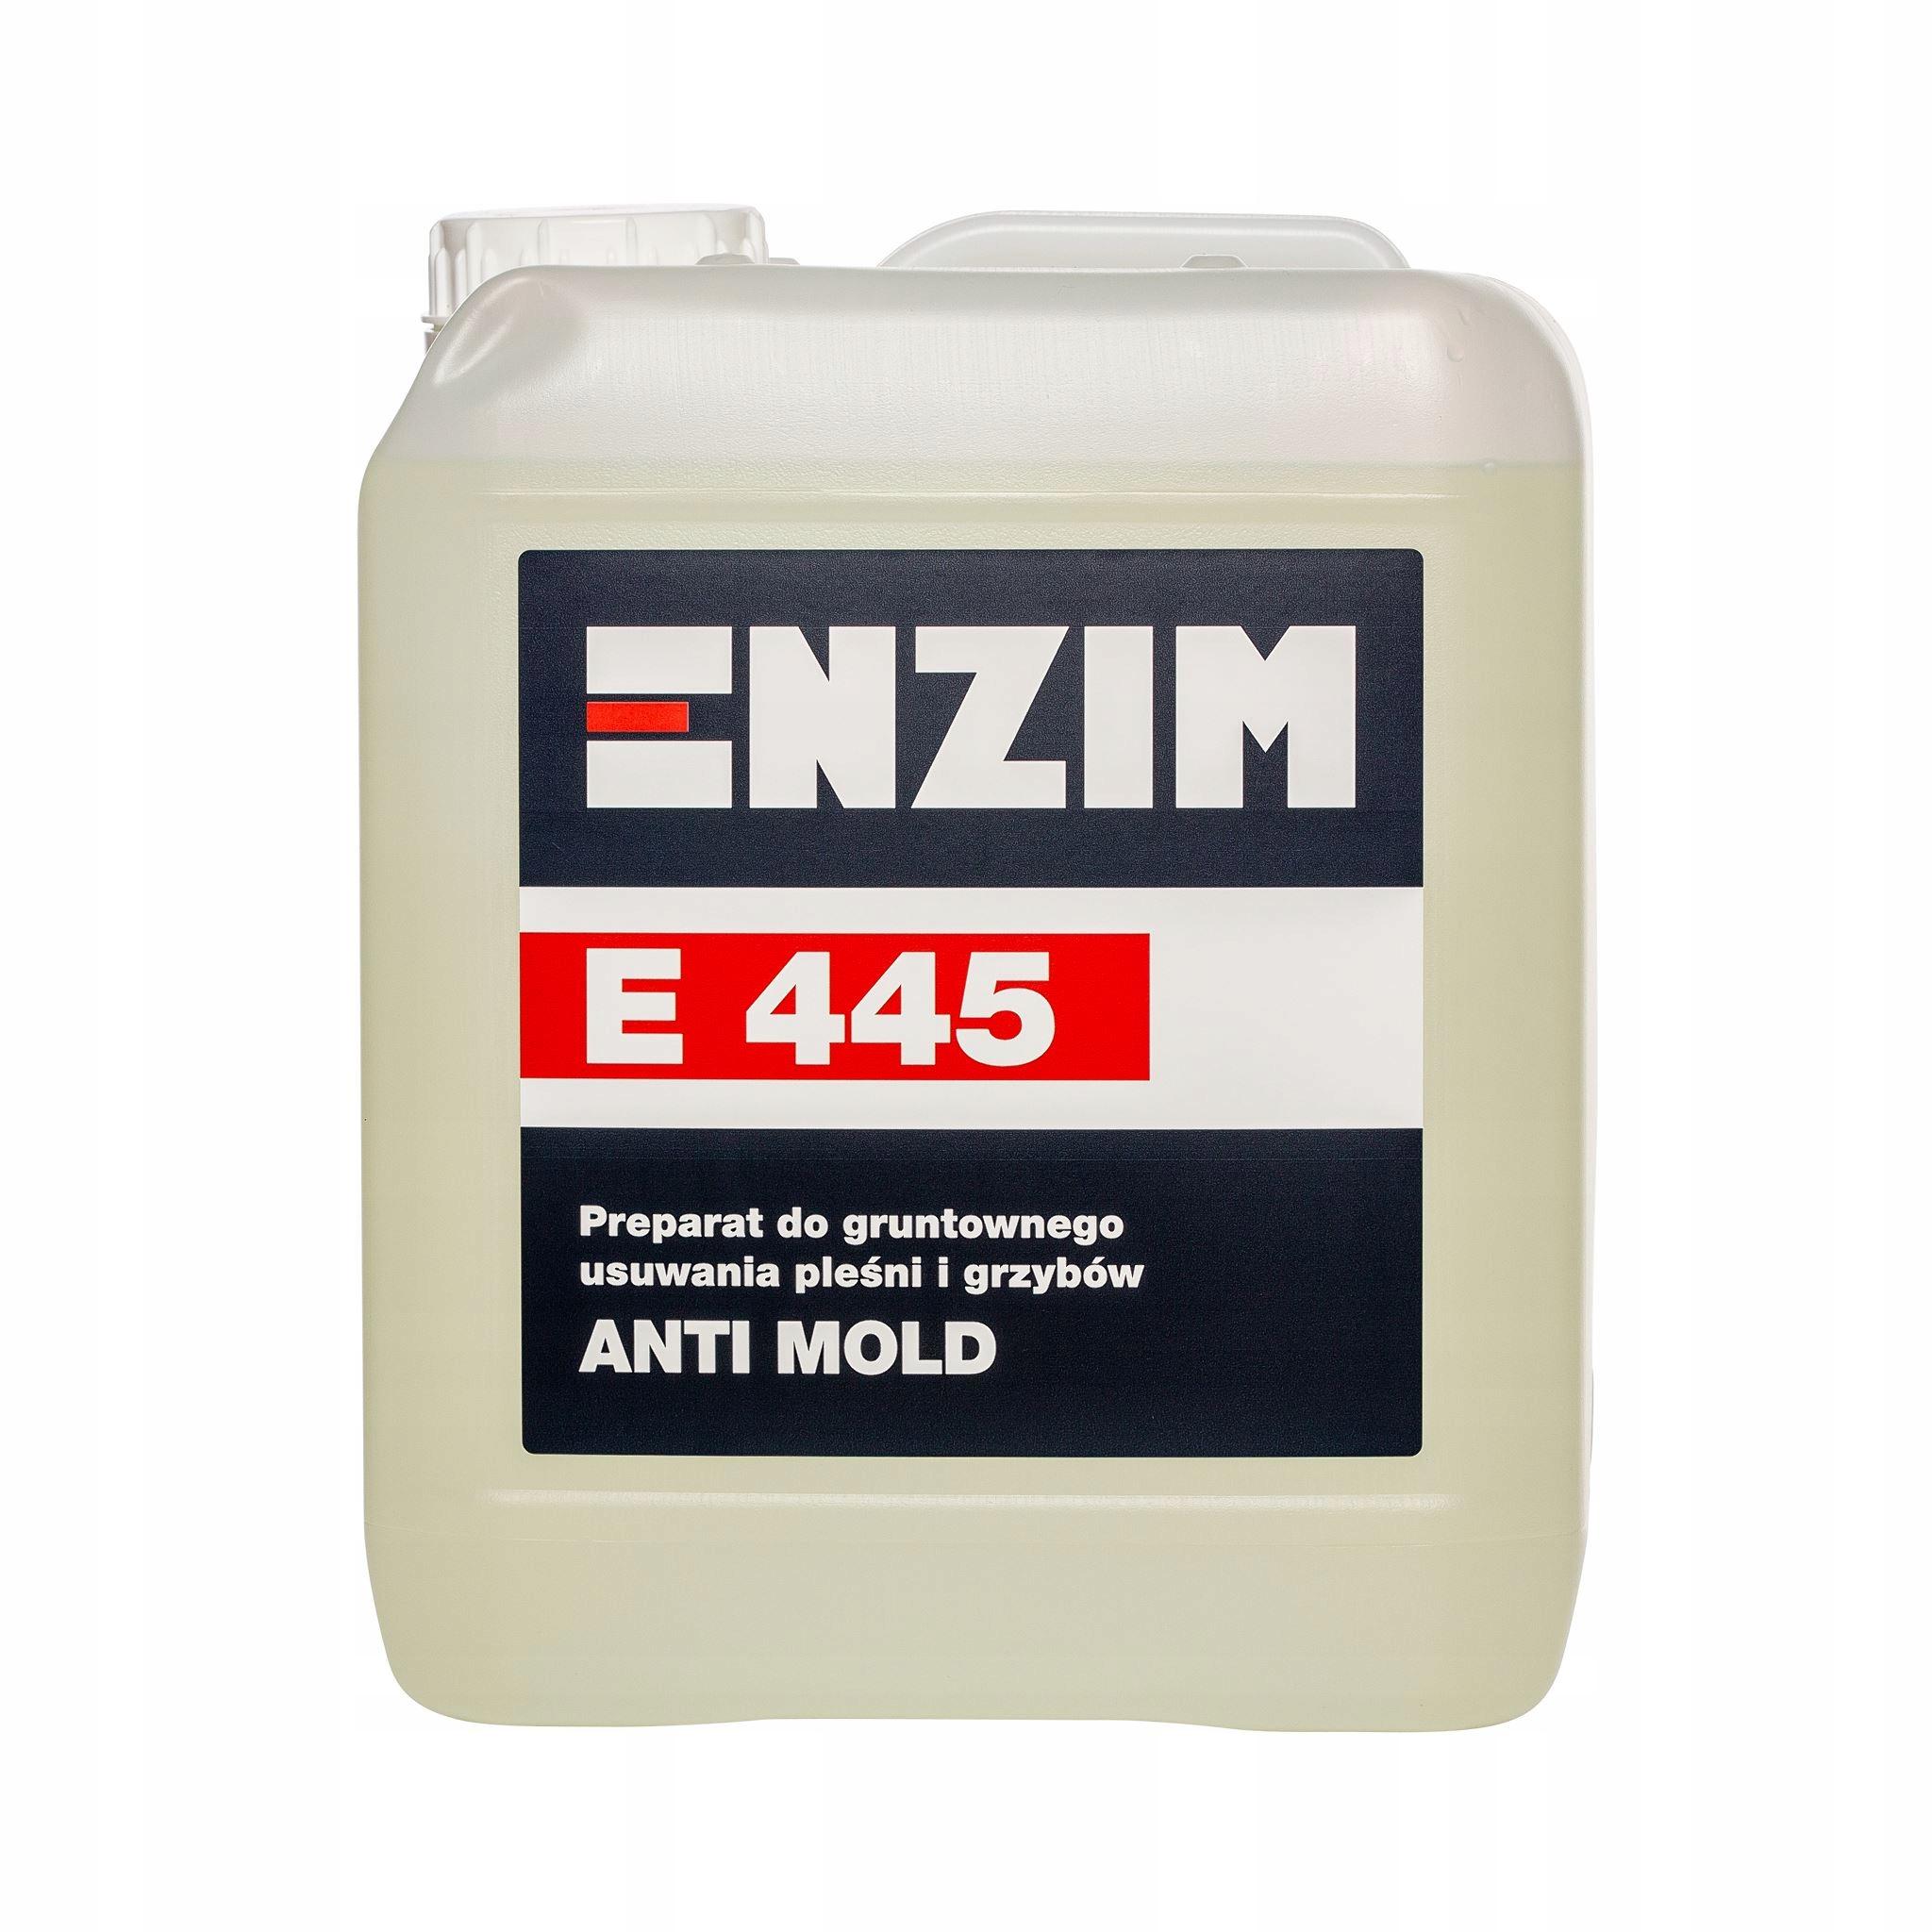 E 445 ENZIM удаление плесени грибка 5 Л